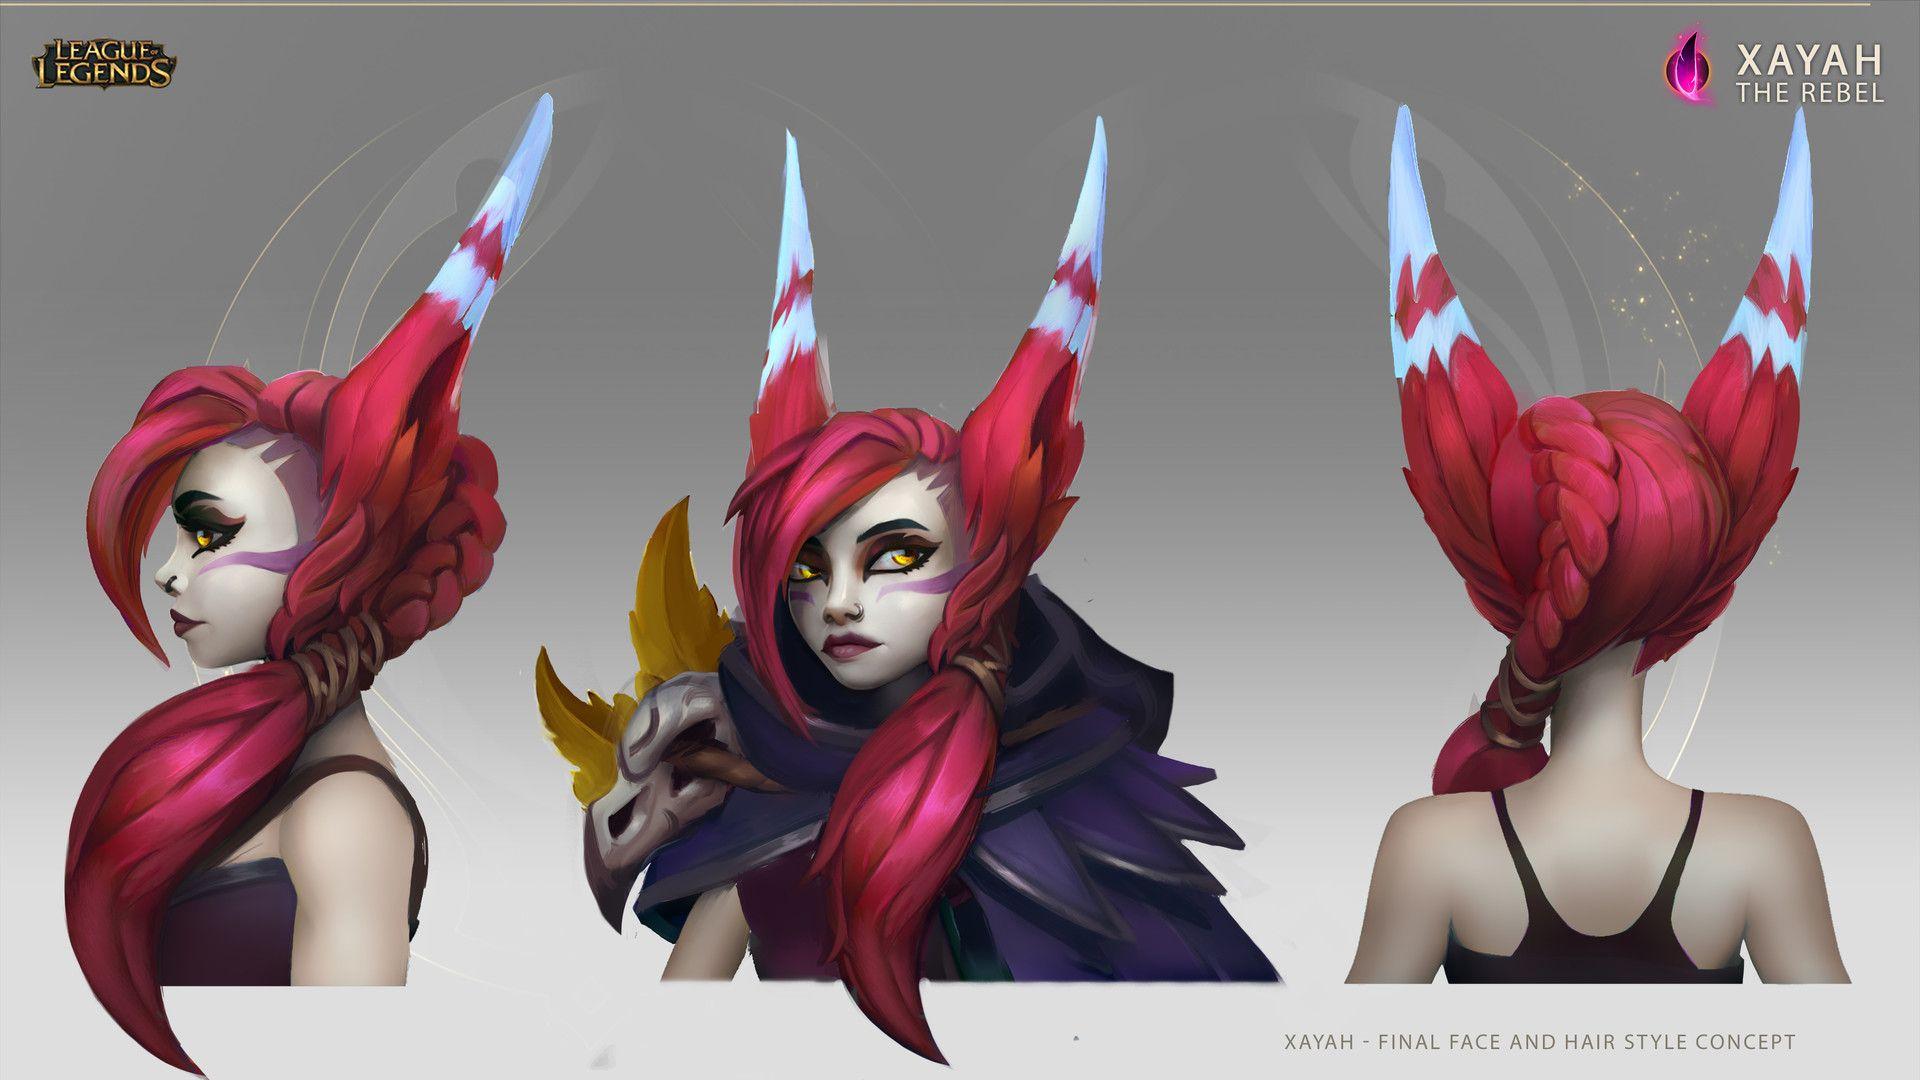 Xayah Character Design : Artstation xayah the rebel concept art daniel orive